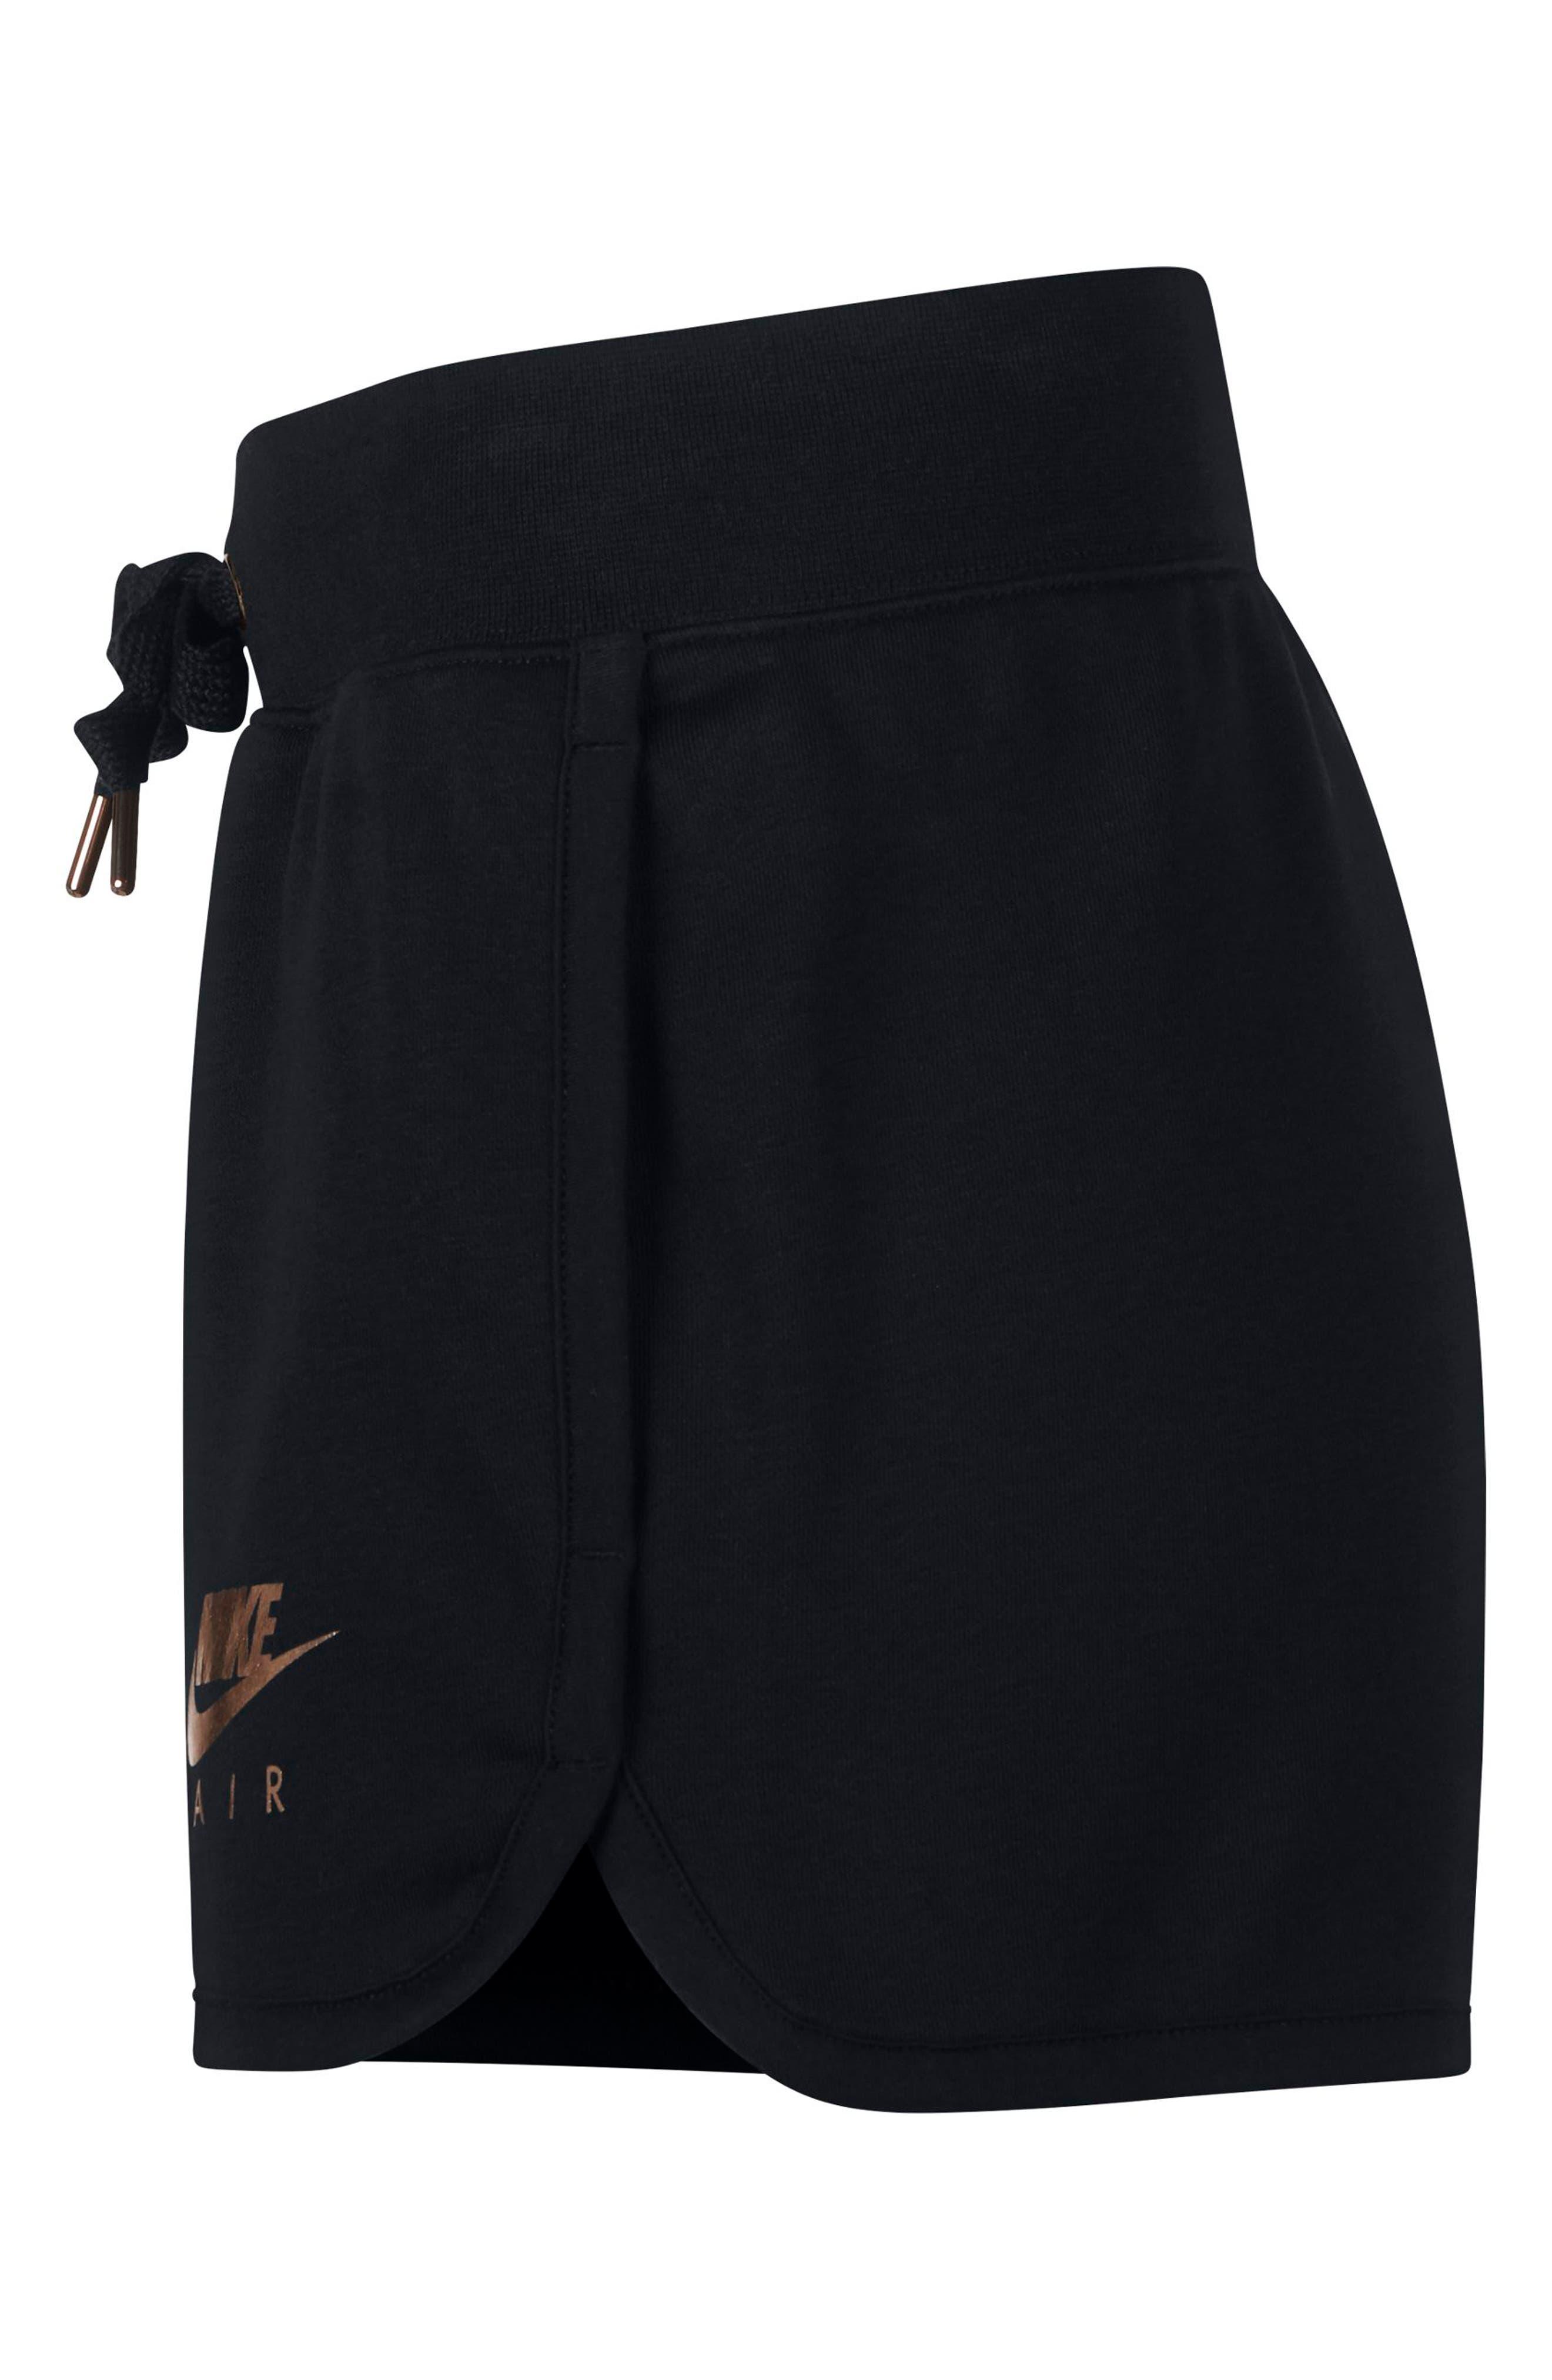 Sportswear Air Shorts,                             Alternate thumbnail 9, color,                             010